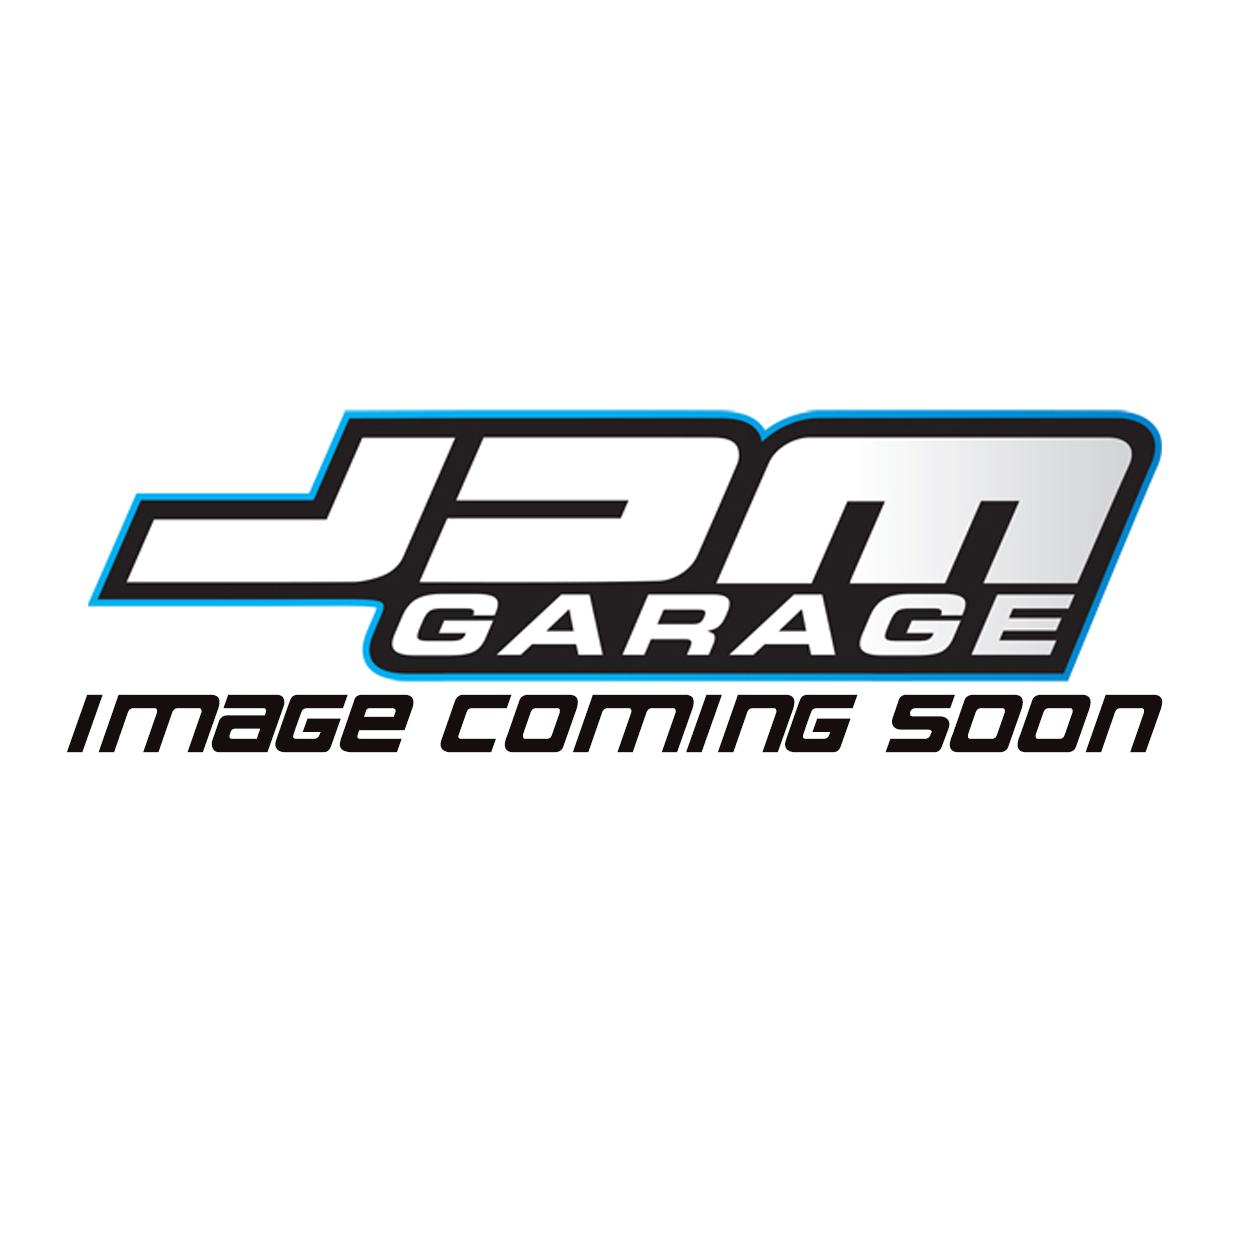 Exedy Clutch Kit Organic / Paddle / Hyper Single For Nissan Silvia S13 180SX 200SX SR20DET CA18DET